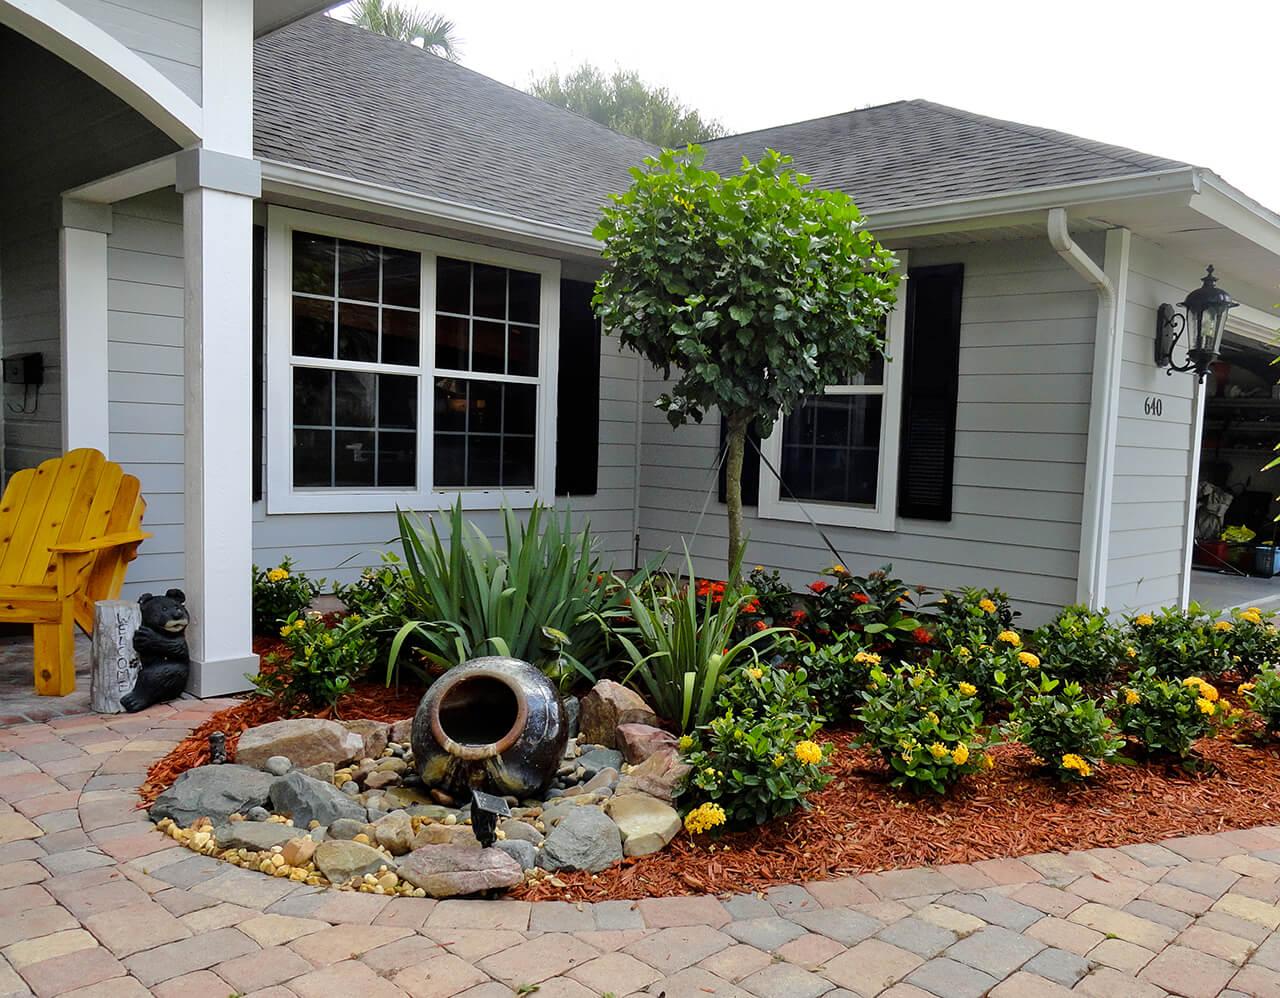 Superb 20 Brilliant Front Garden Landscaping Ideas Style Motivation Largest Home Design Picture Inspirations Pitcheantrous